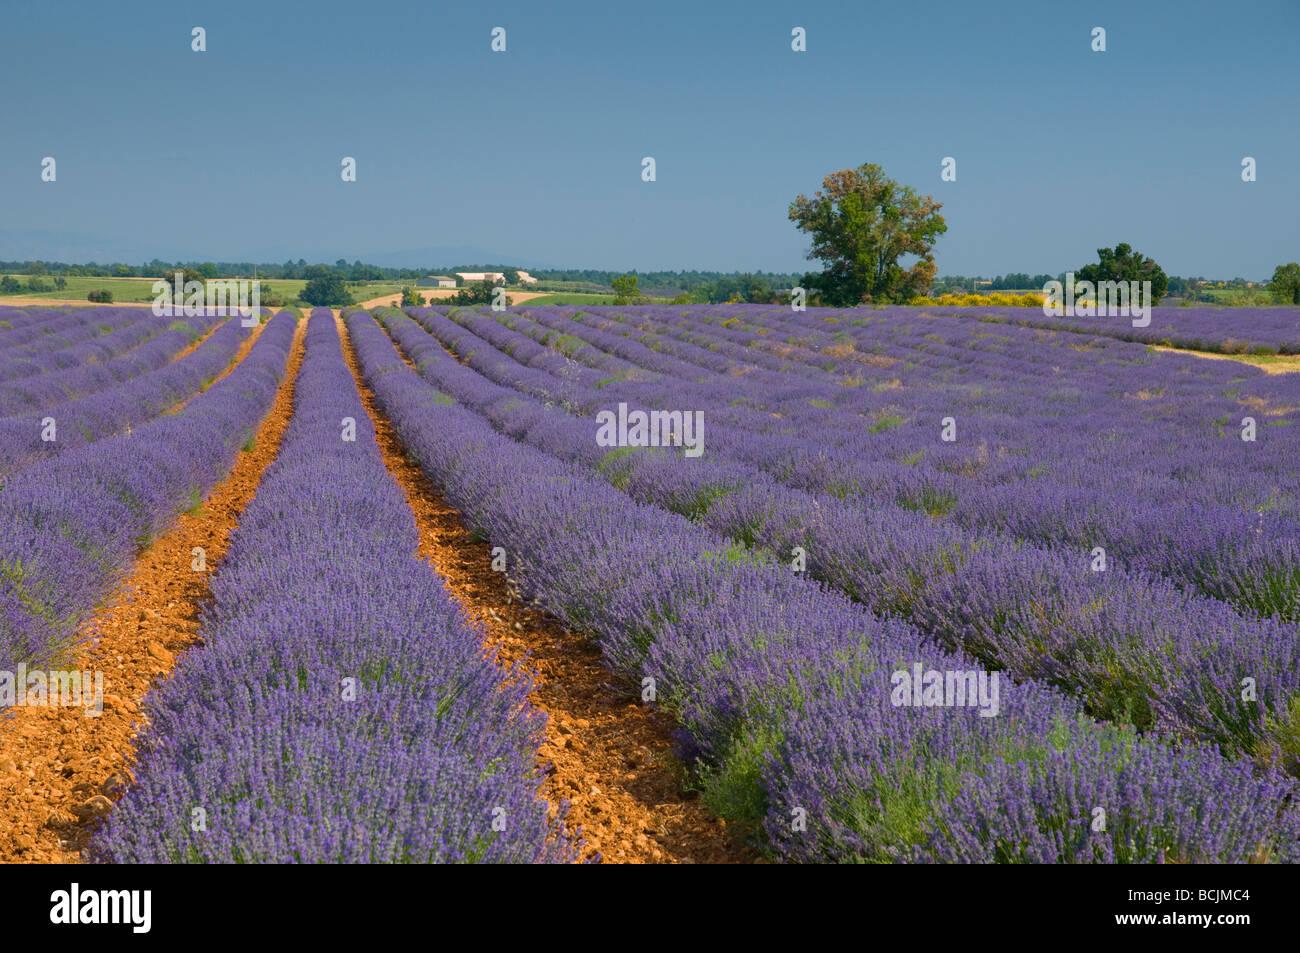 Francia, Provence-Alpes-Côte d'Azur, Alpes-de-Haute-Provence, Valensole, campi di lavanda Immagini Stock